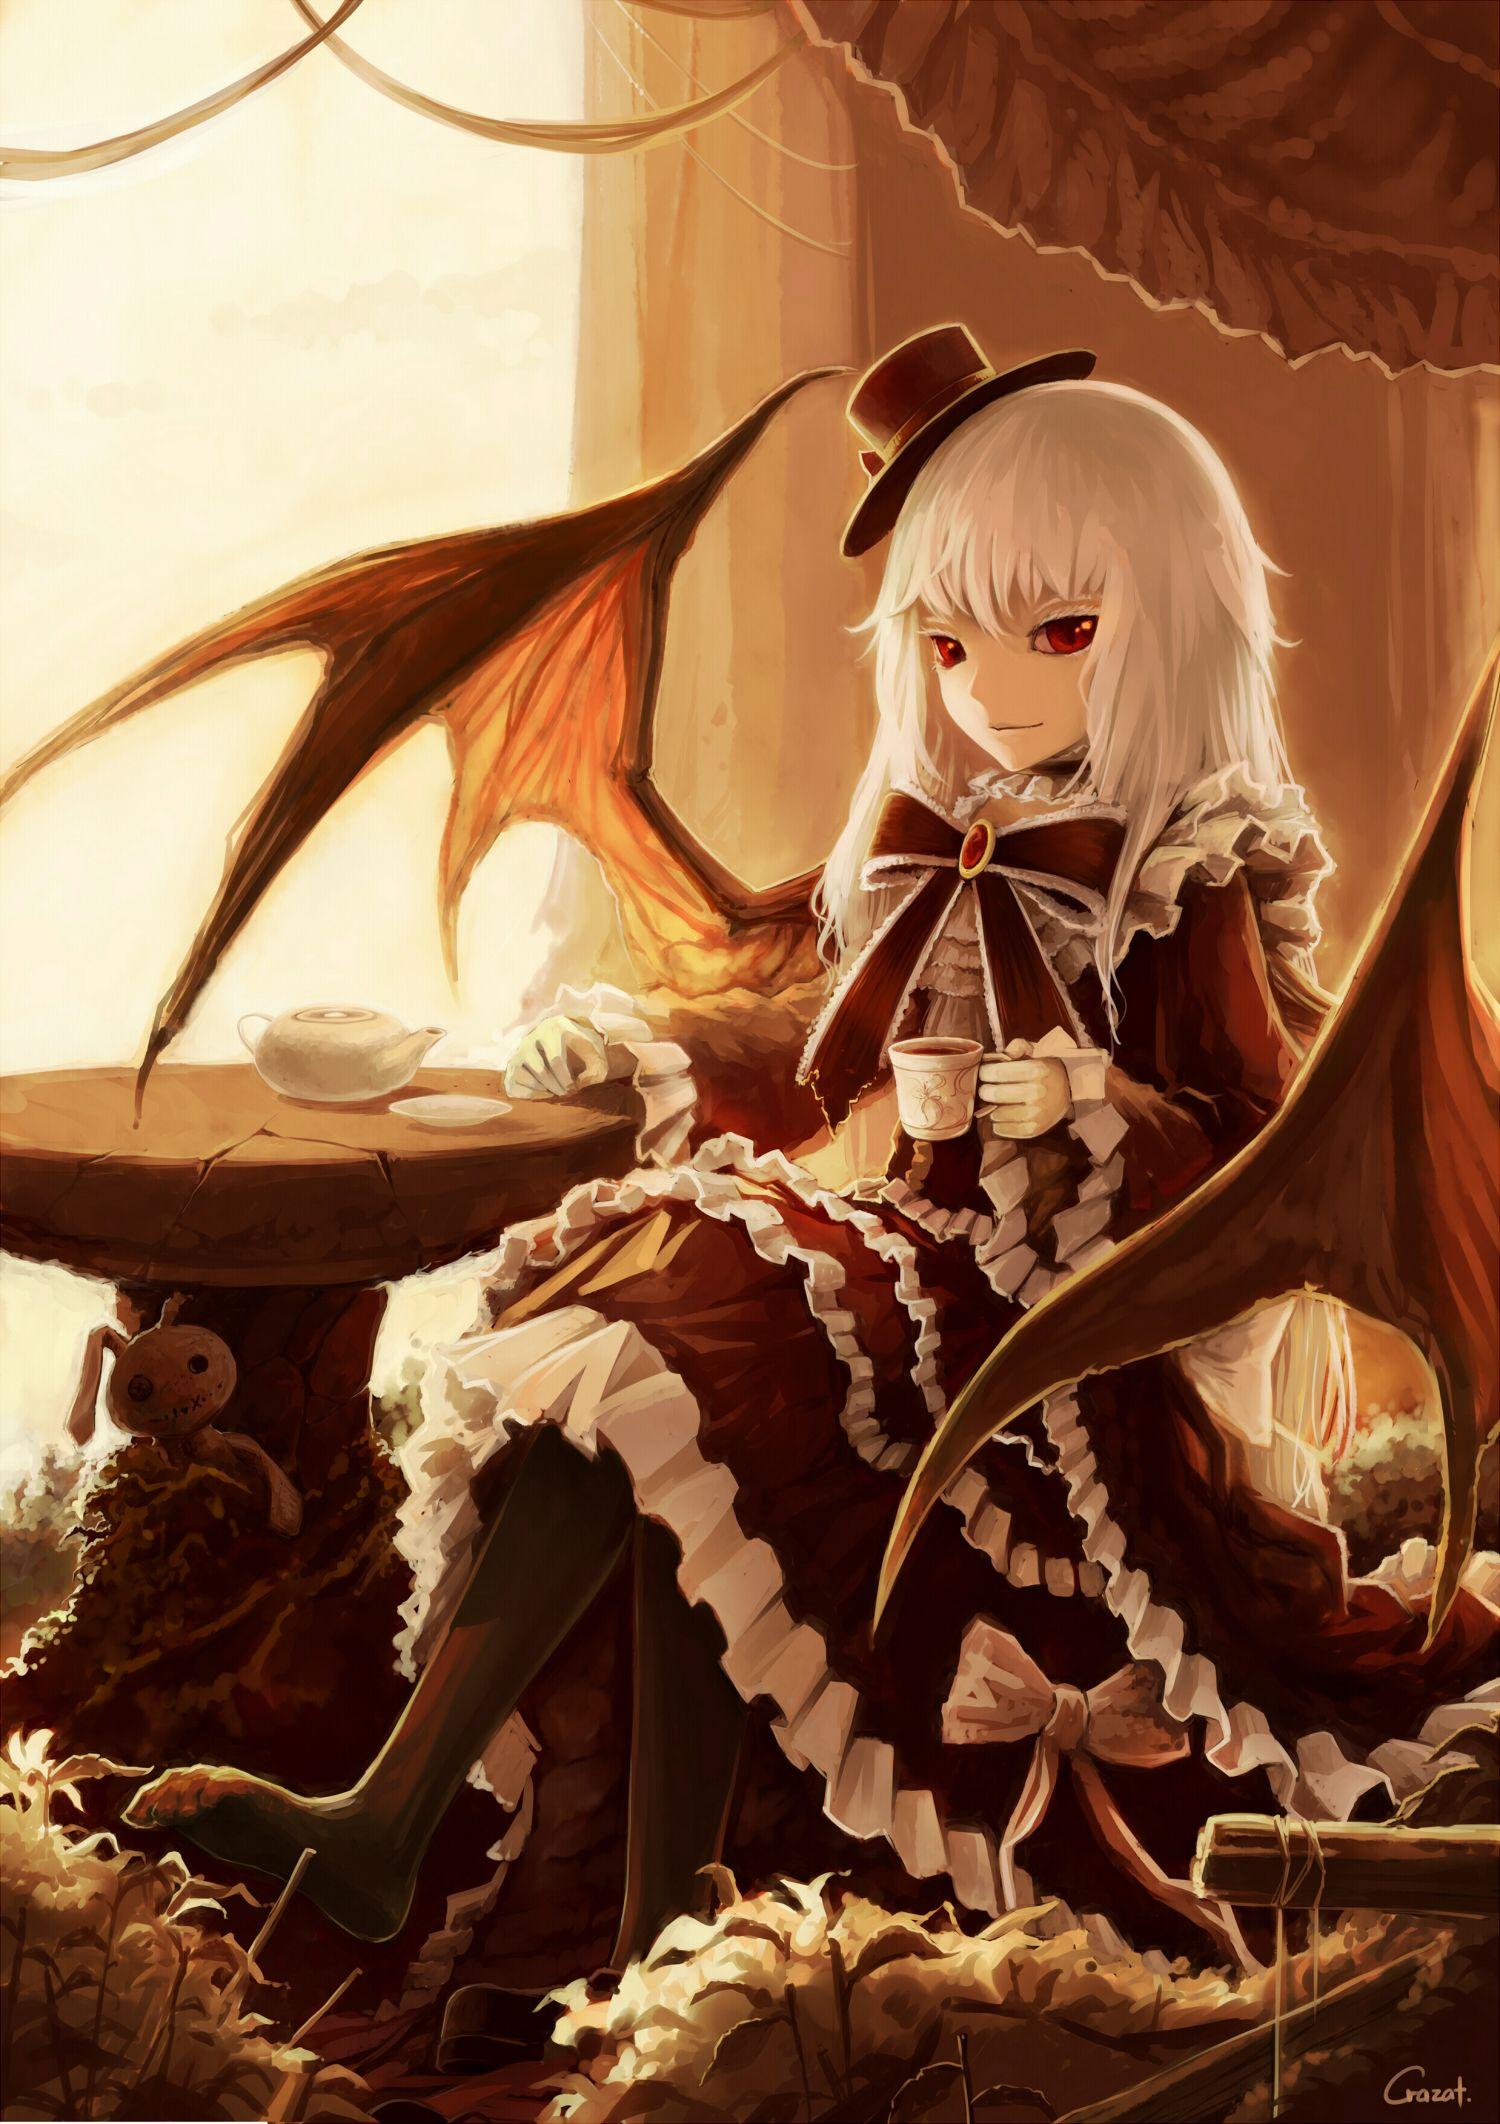 anime girl in lolita with wings Anime Anime, Anime